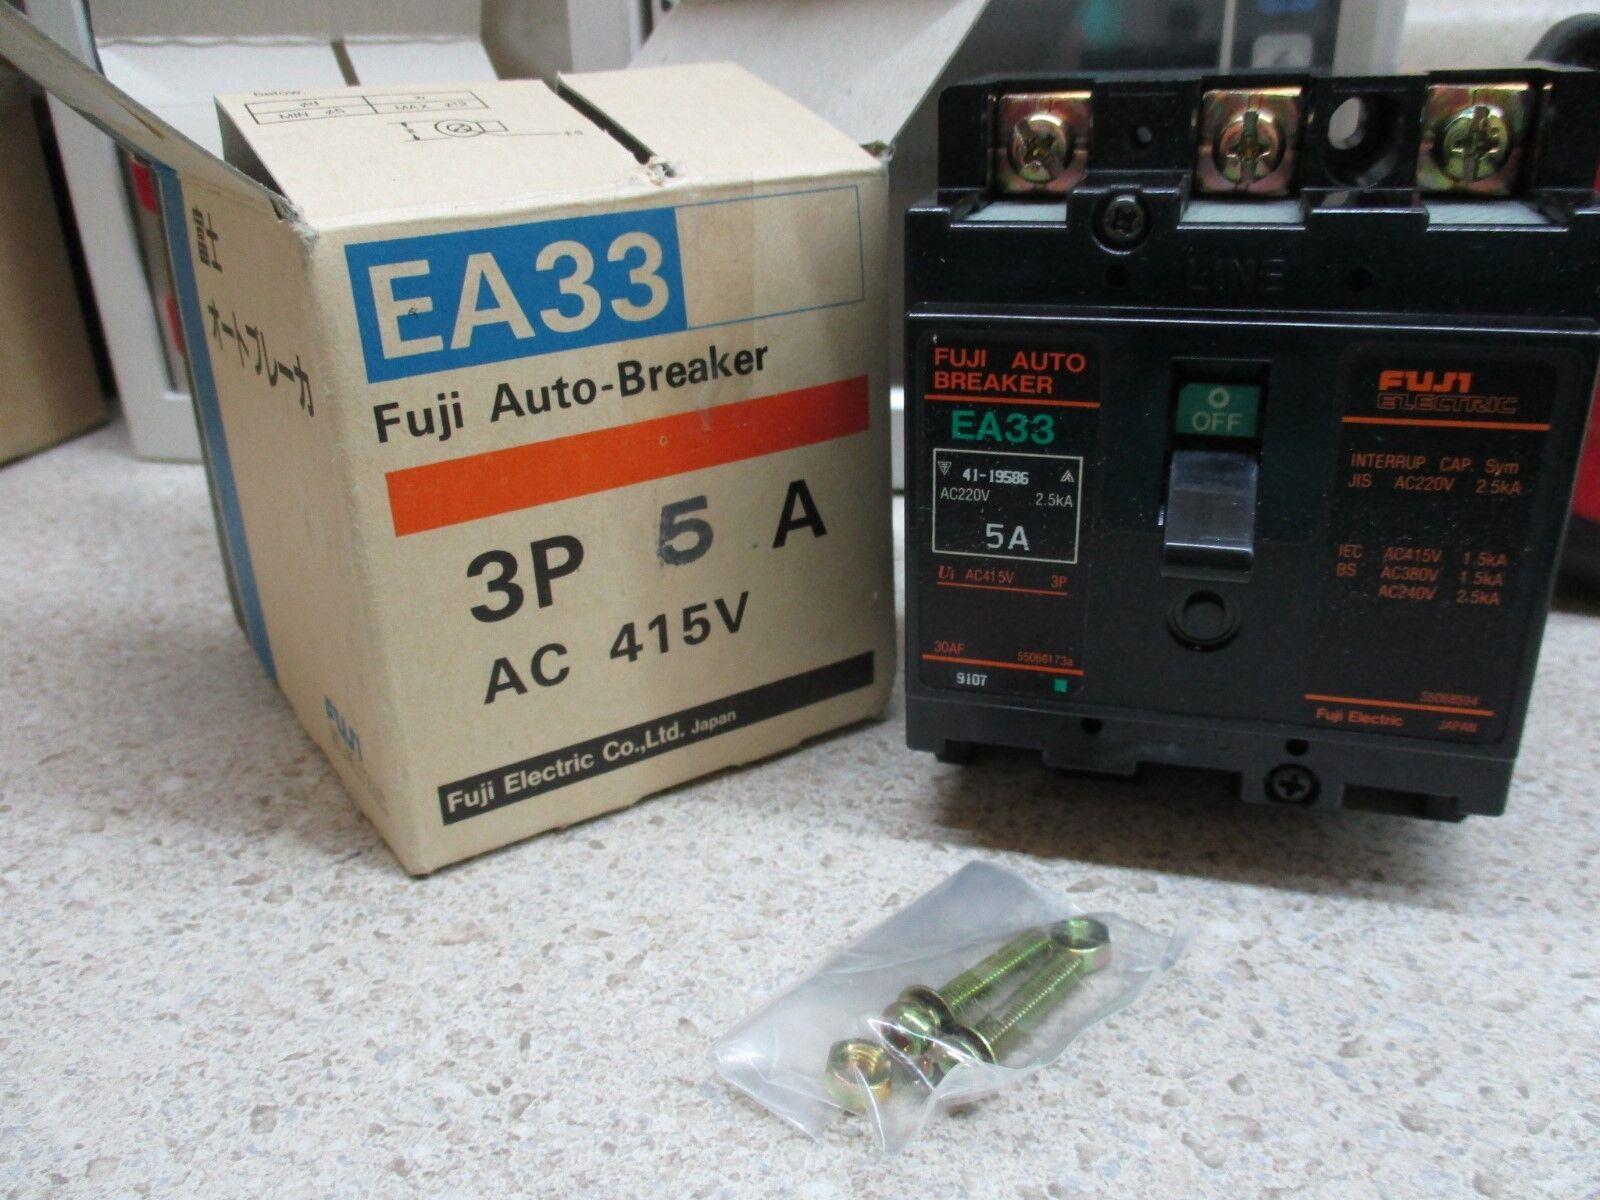 FUJI AUTO BREAKER EA33 41-19586 AC220V 2.5KA 5A M NIB